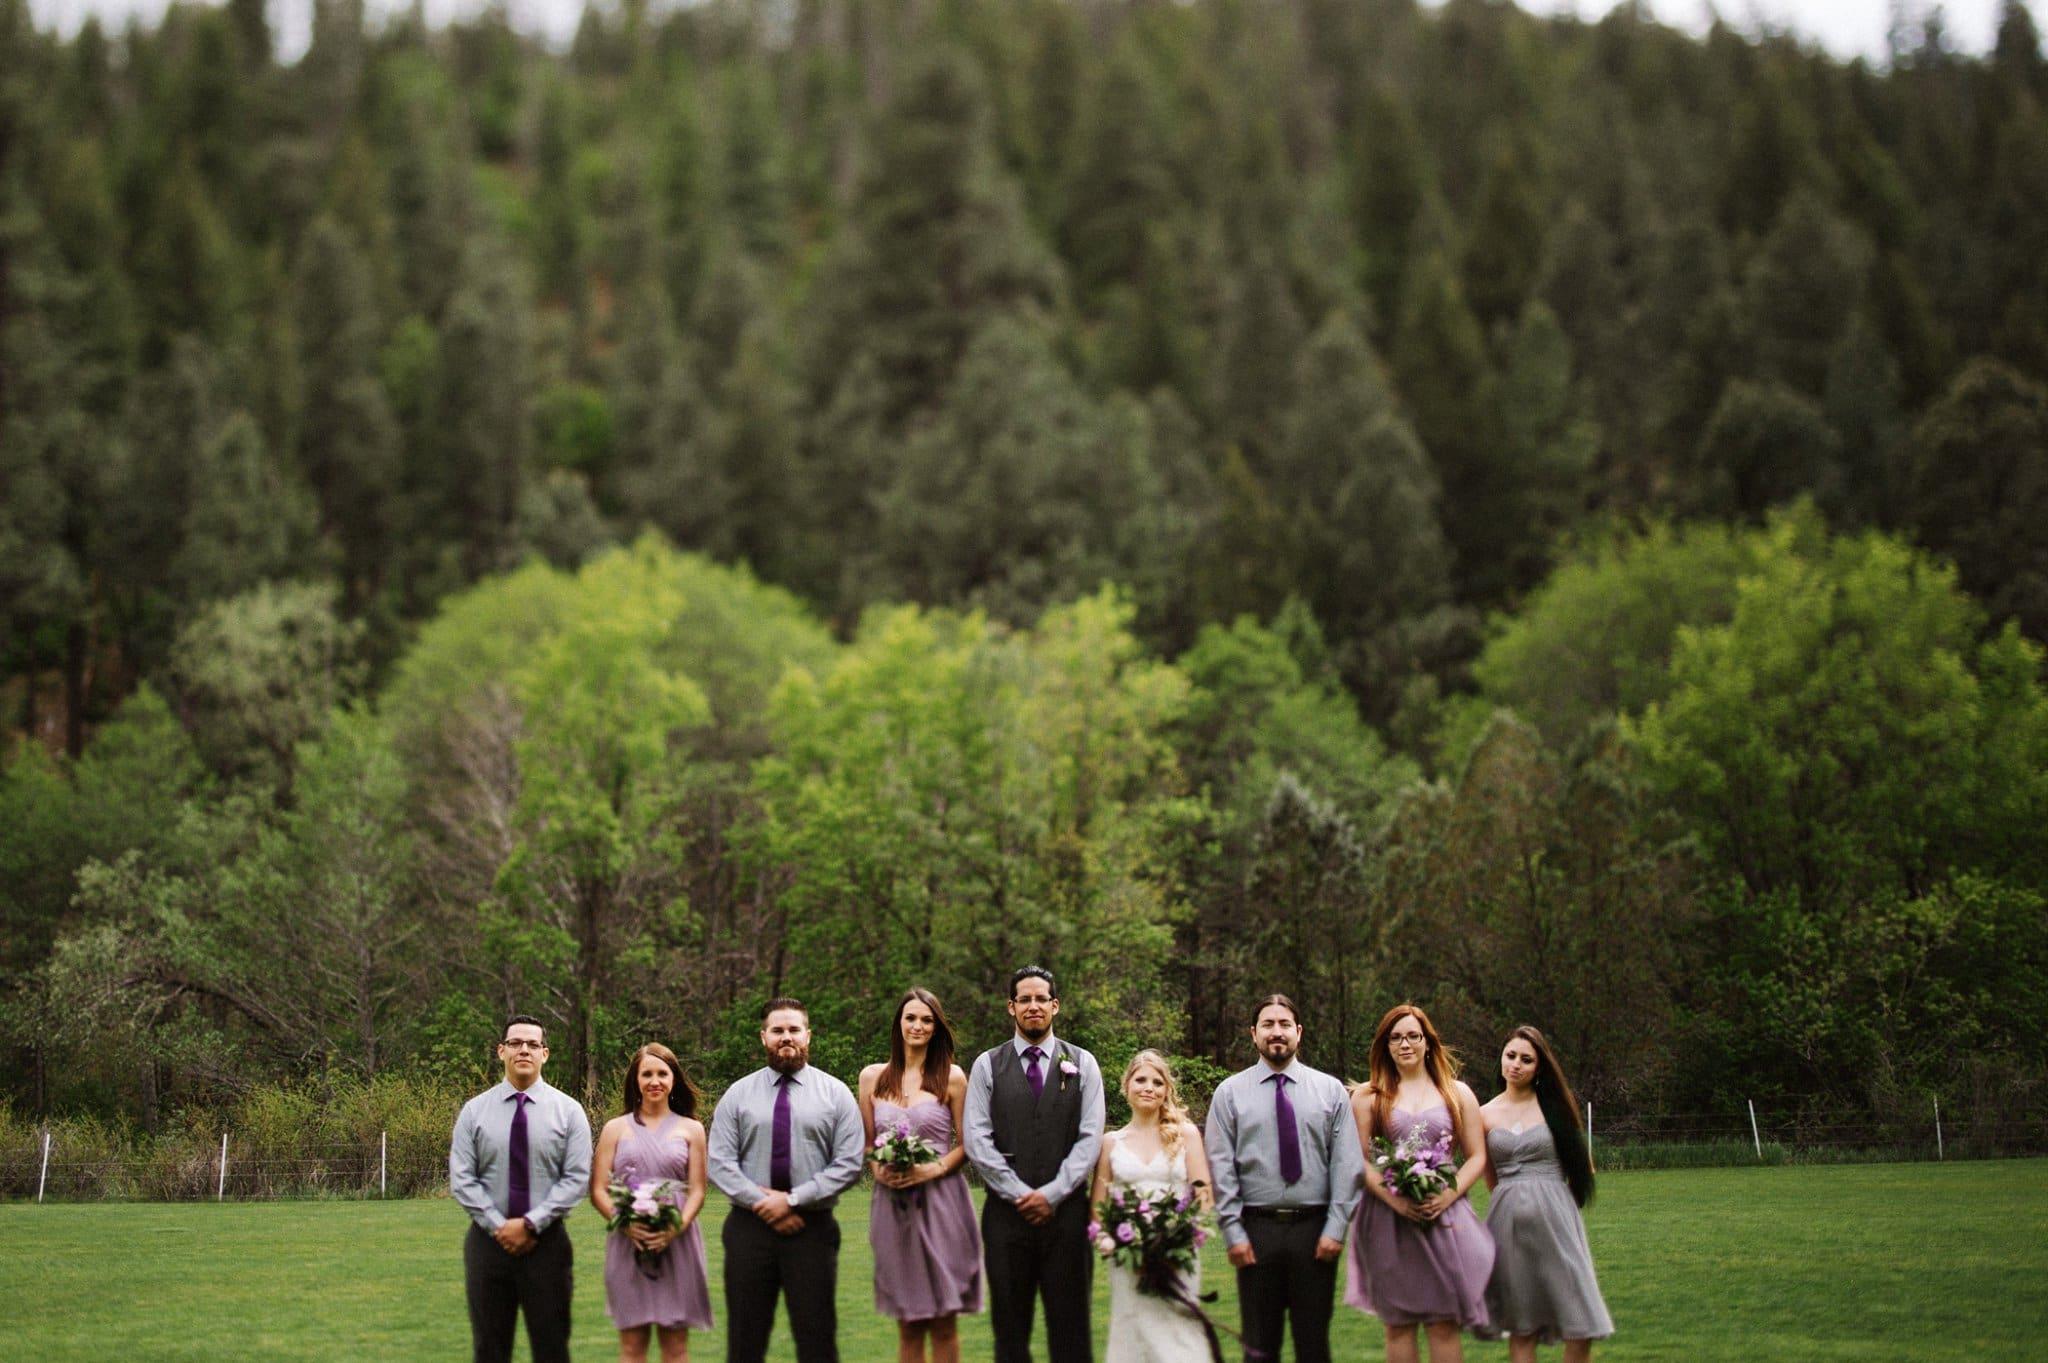 Tonto Creek Camp wedding Arizona by Michigan Photographer Heather Jowett